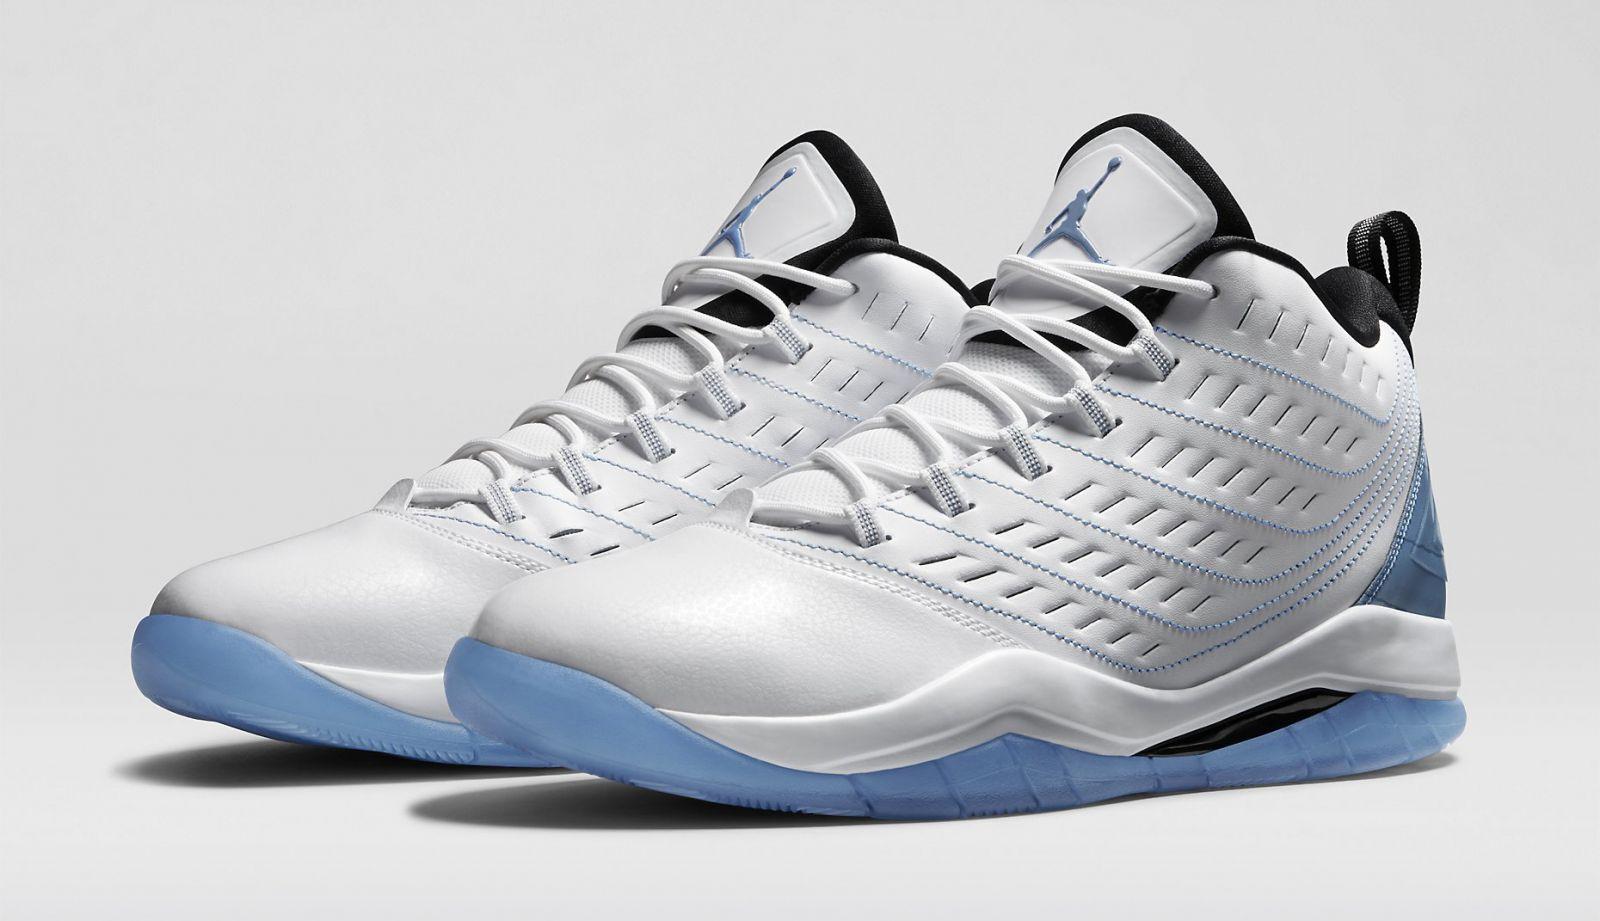 New Nike Jordan Velocity Basketball shoes Men's Size US 10 White Legend bluee